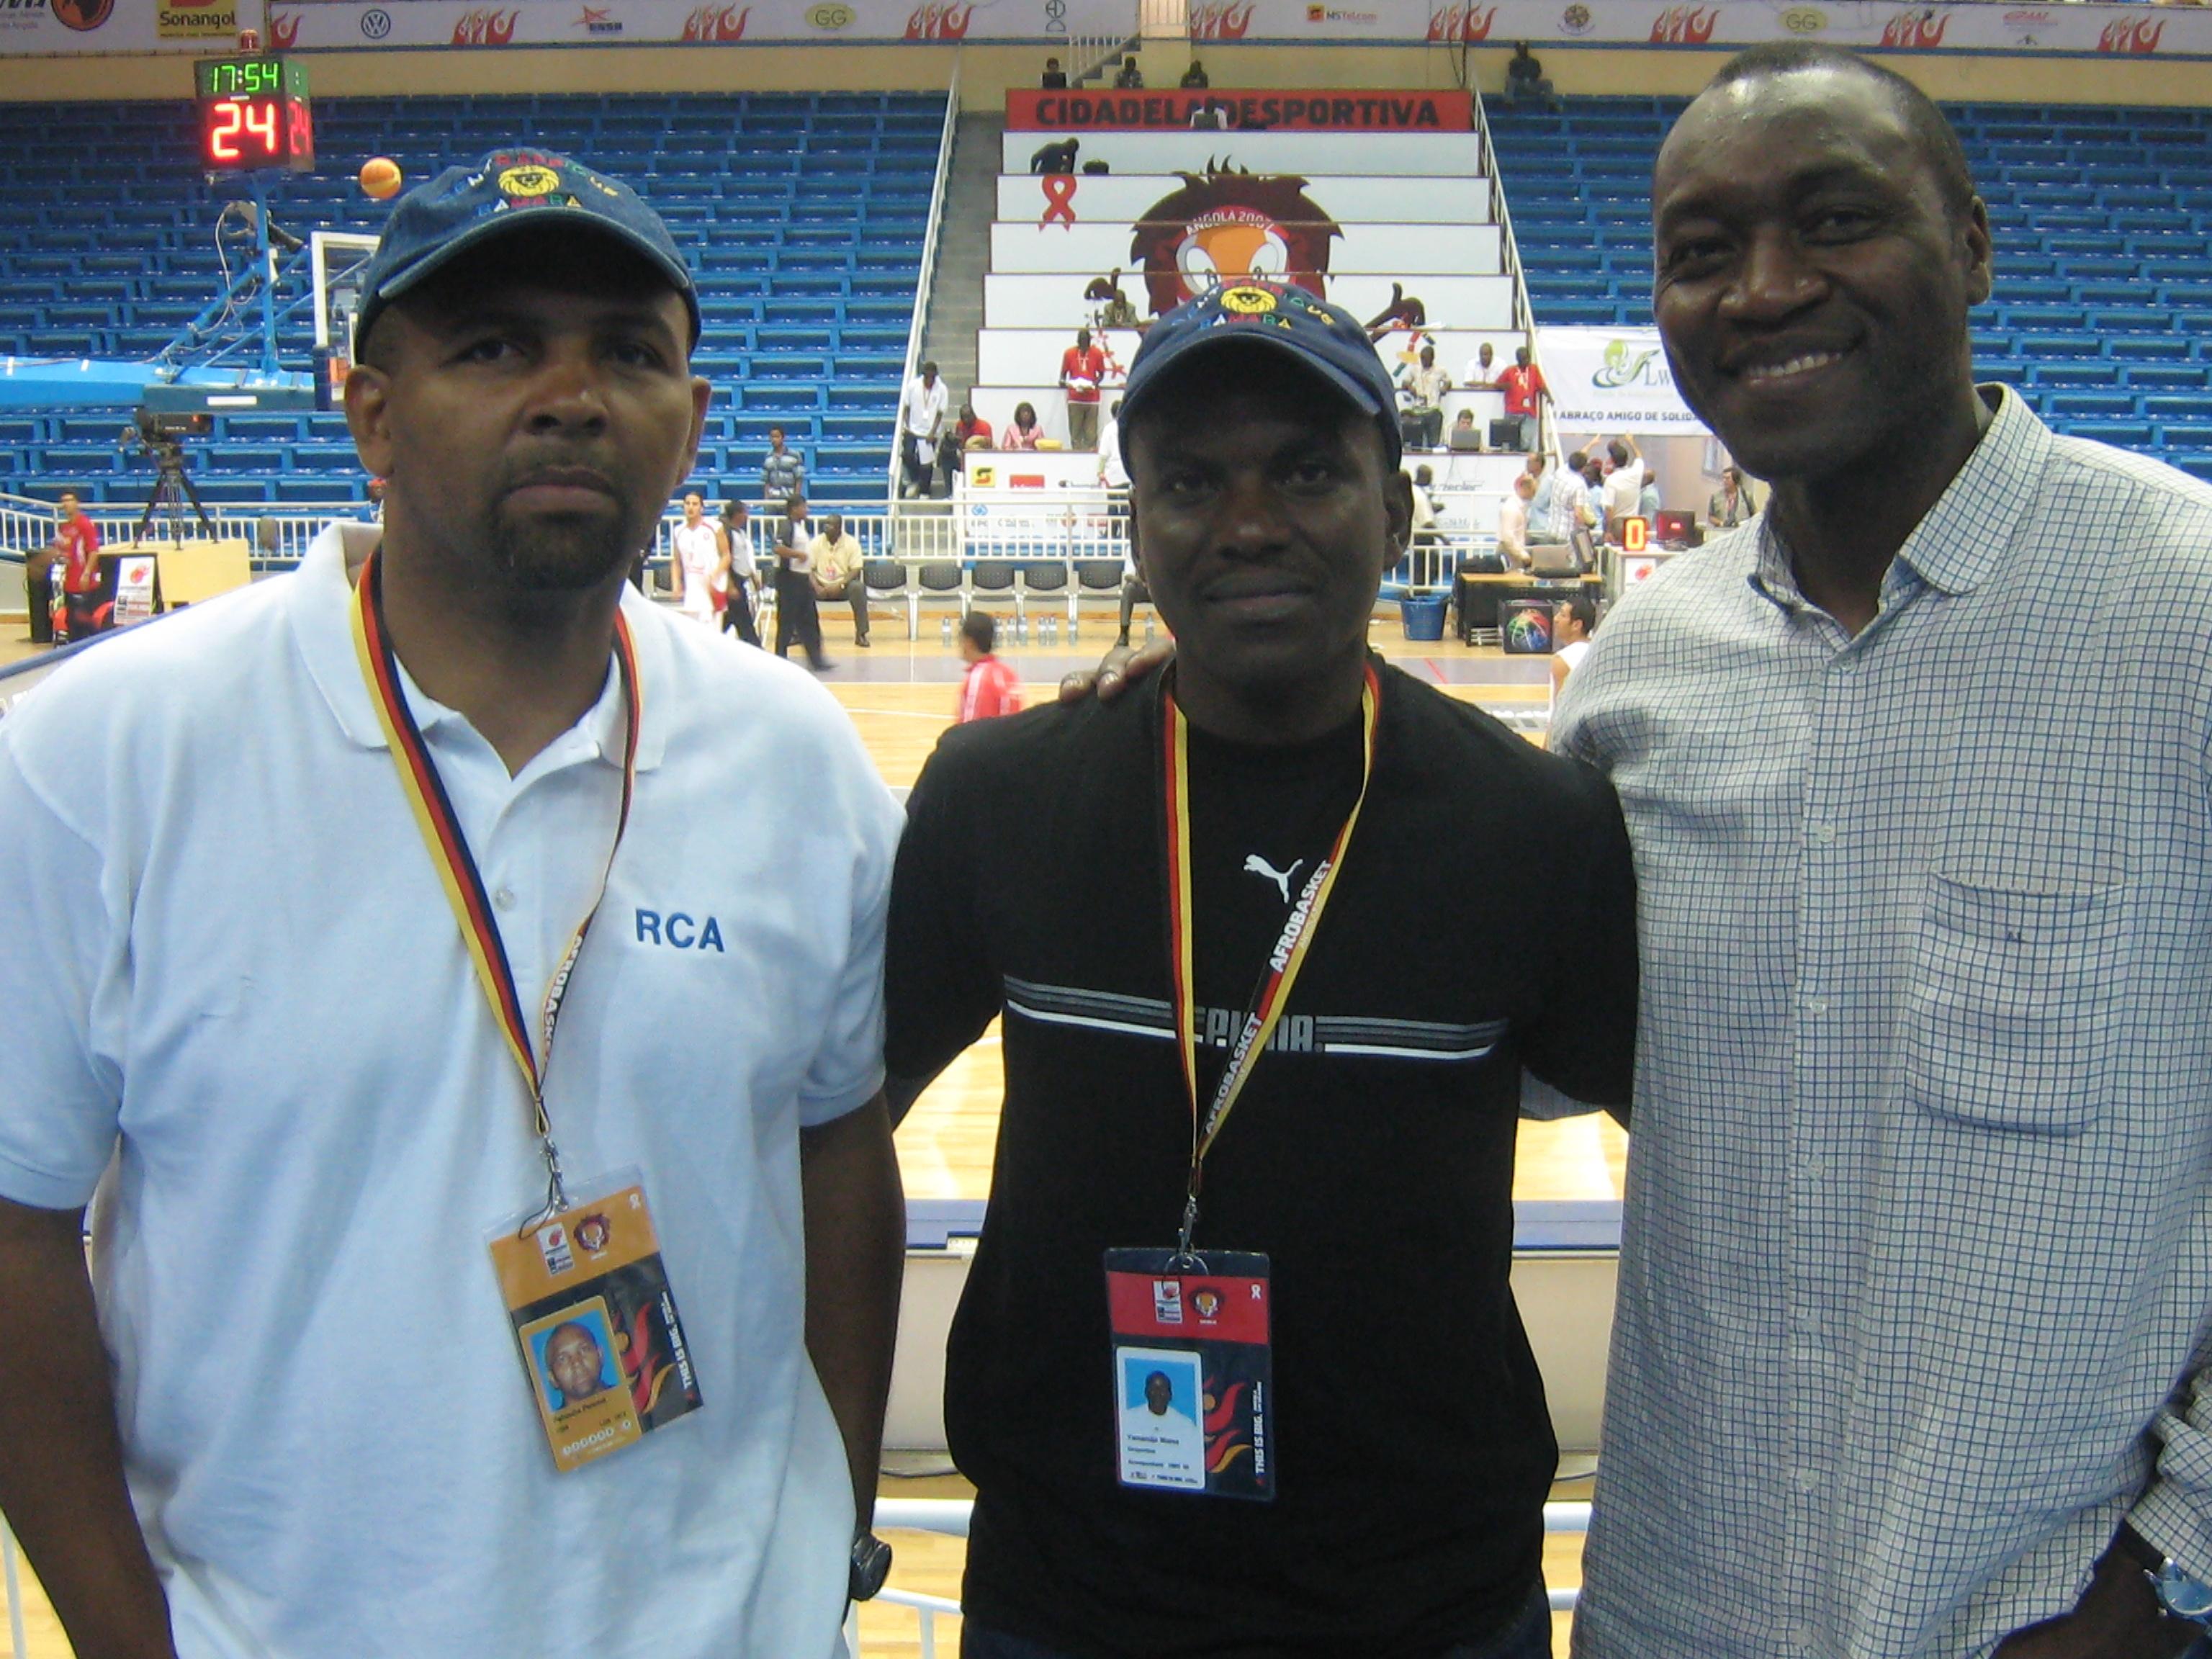 Eugène Pehoua DTN, Blaise Yamandja DTA Mazanga, Anicet Lavodrama recruteur de la NBA